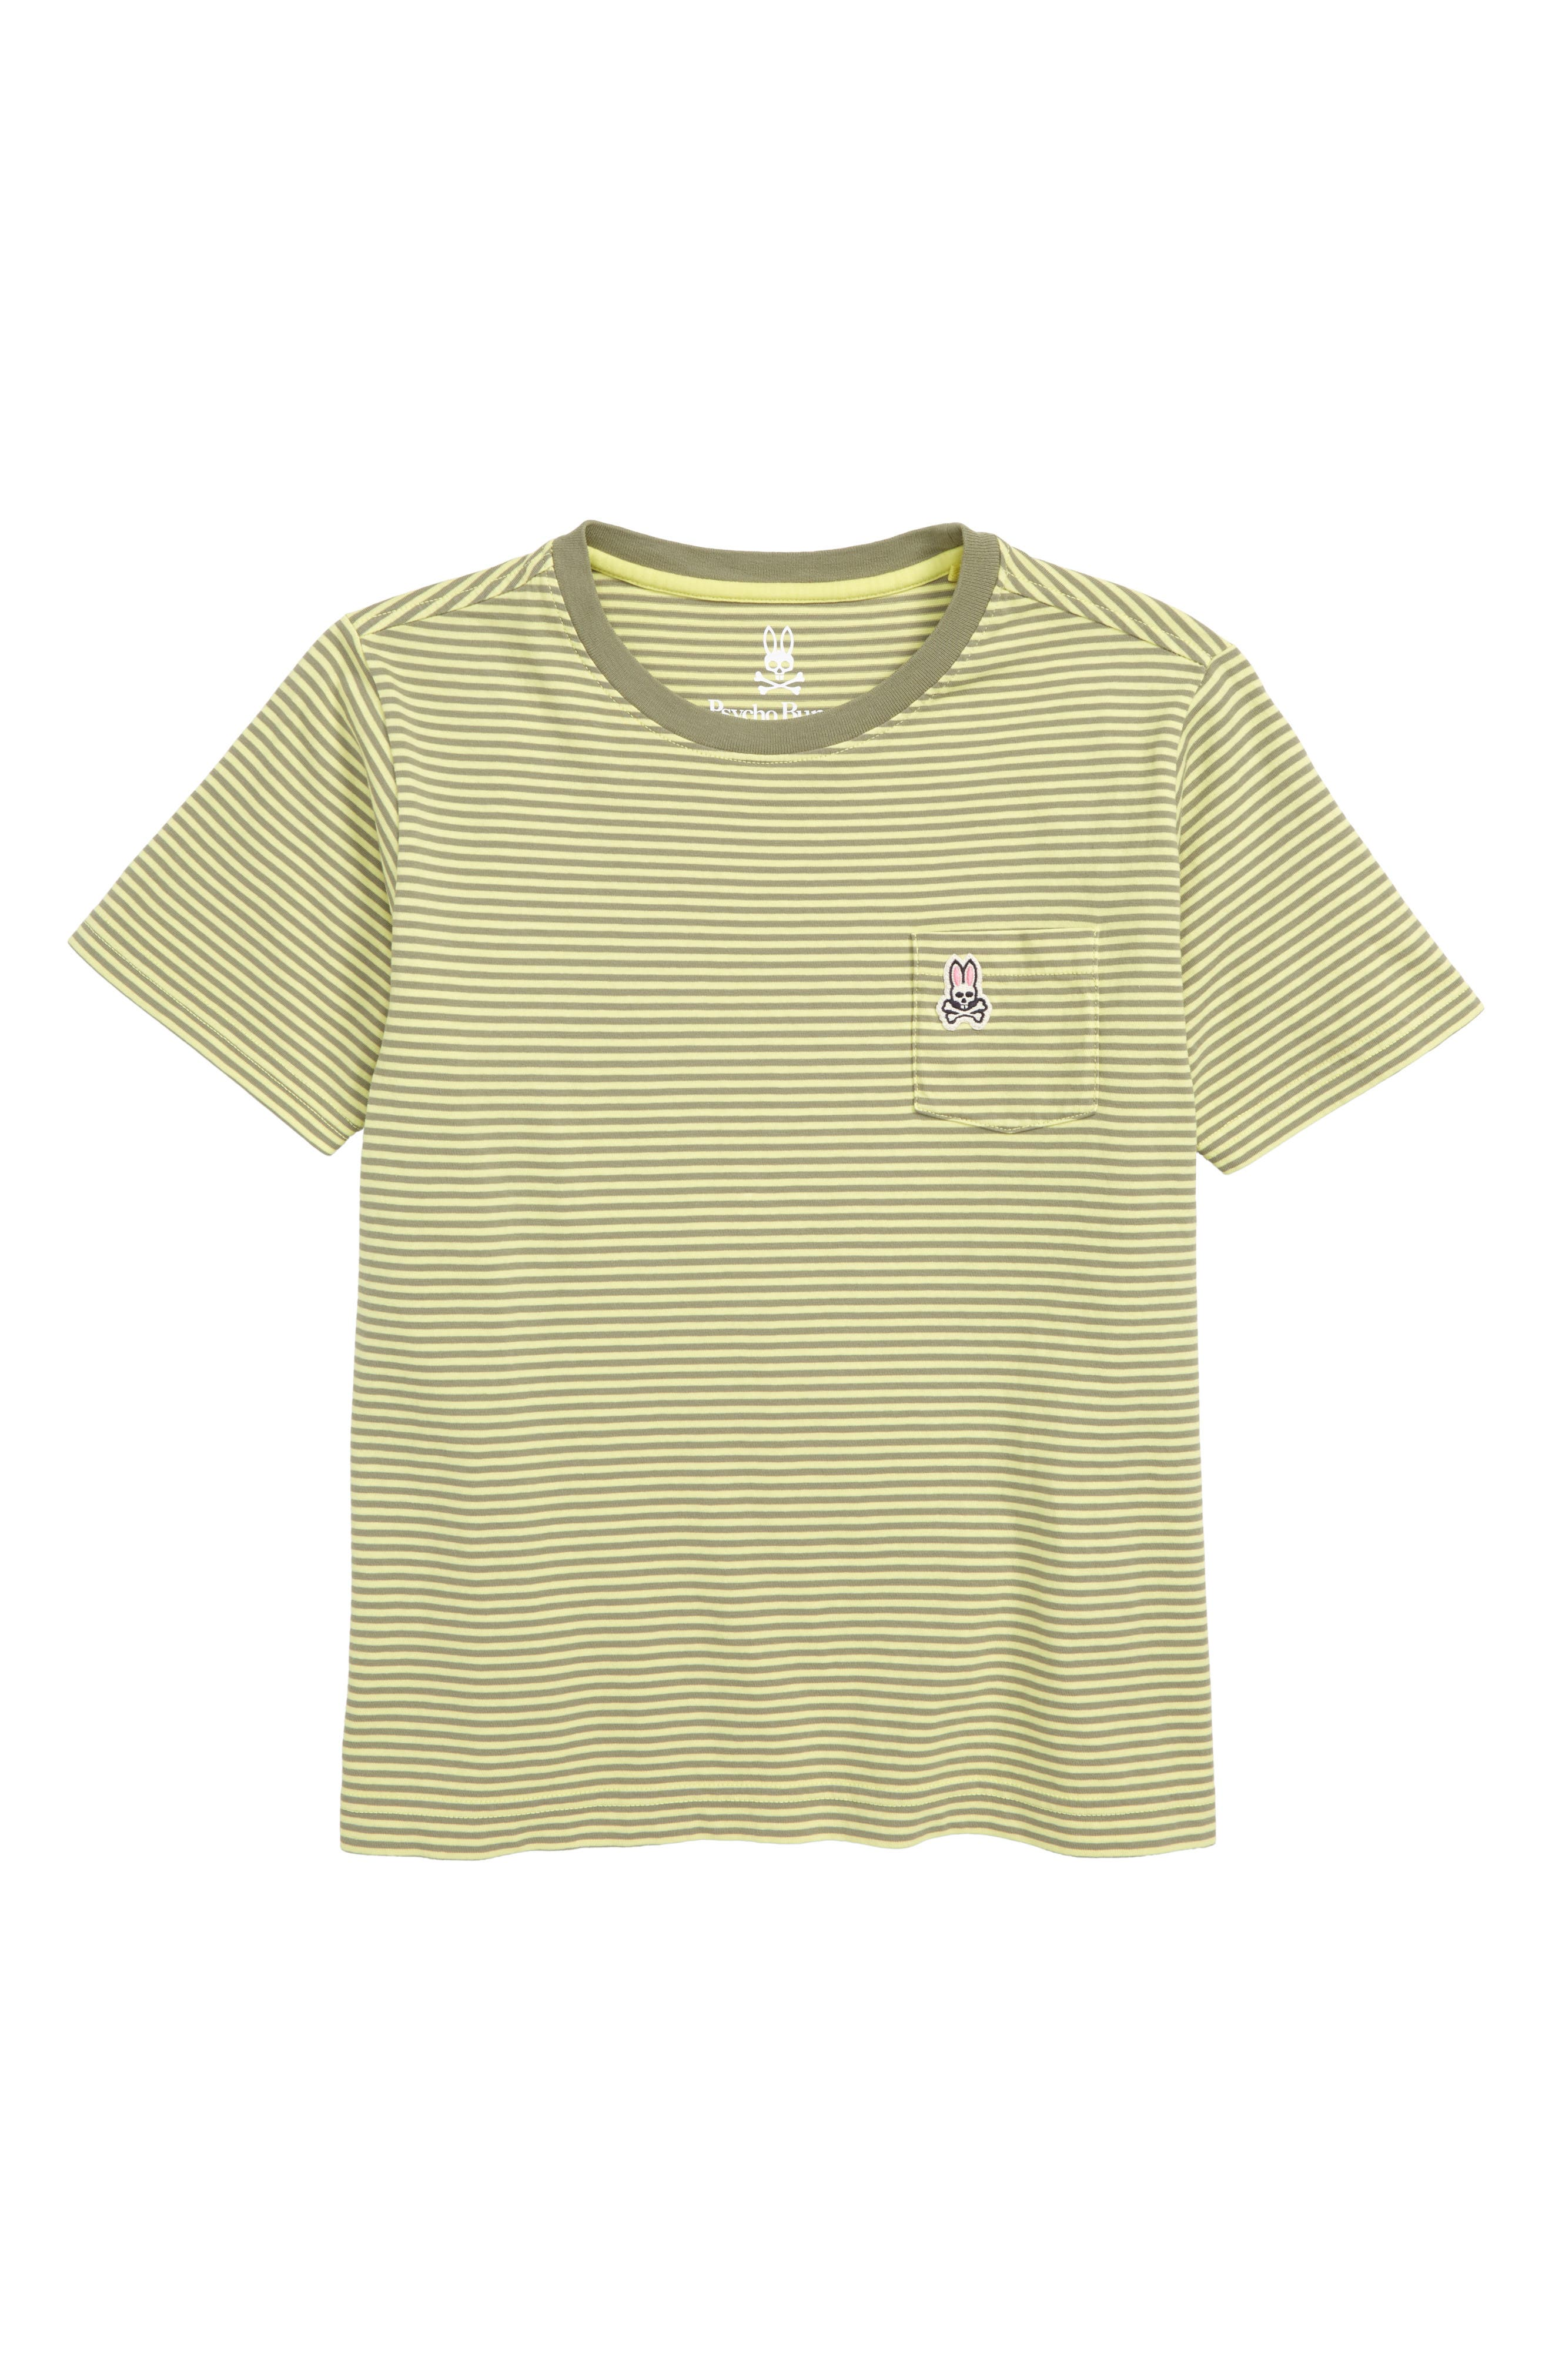 Tamar Pocket T-Shirt,                             Main thumbnail 1, color,                             DAIQUIRI